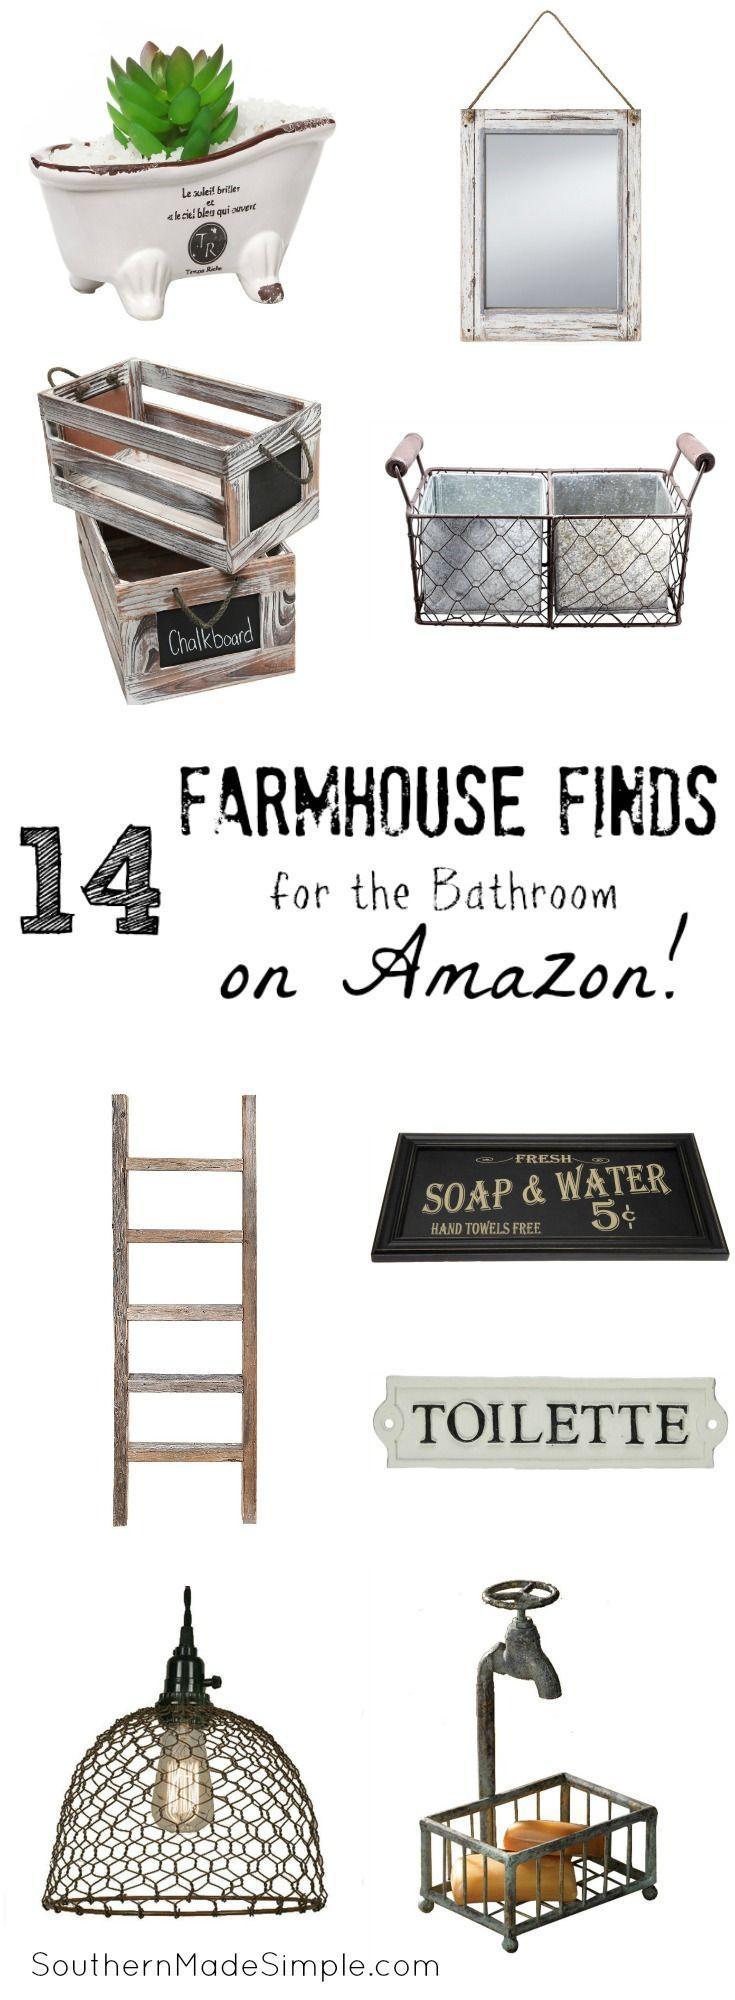 Best 25 Amazon official site ideas on Pinterest Pnr check Fire